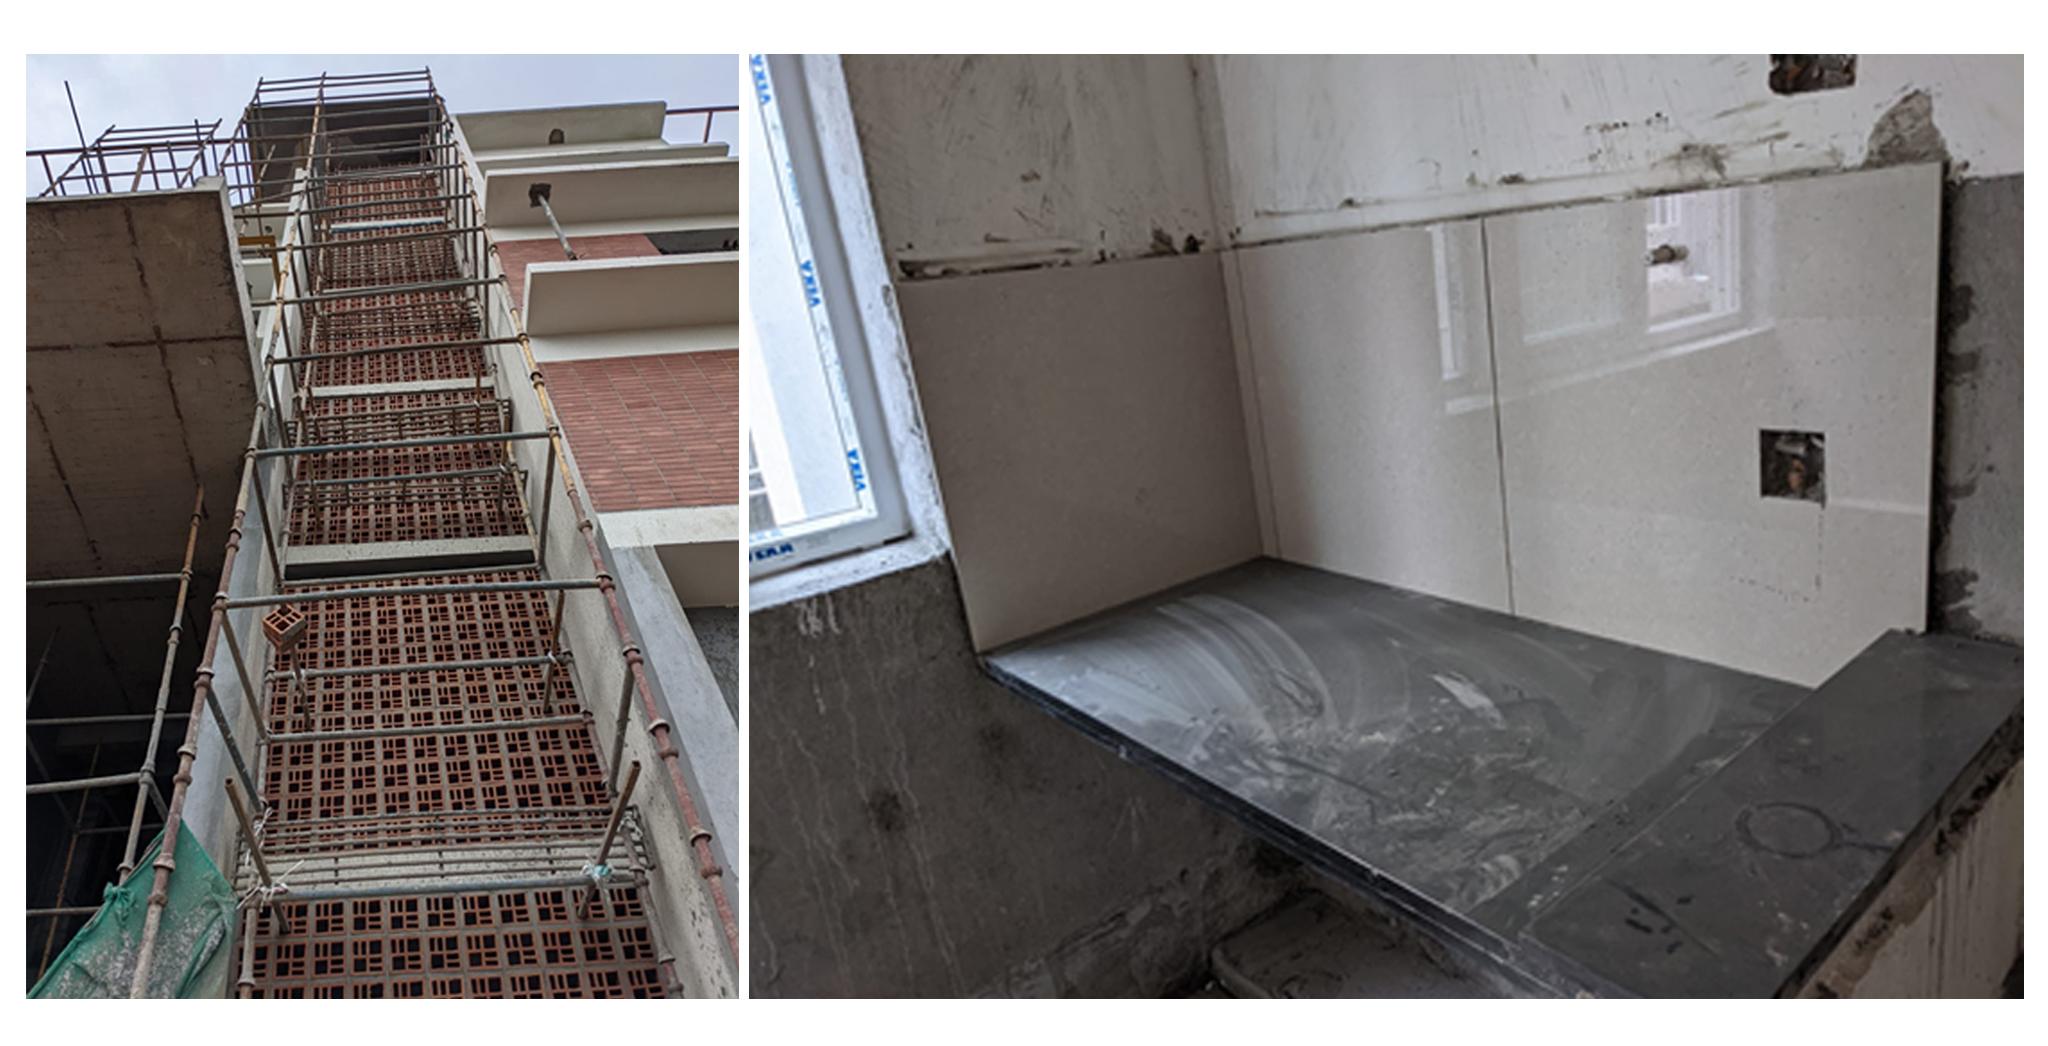 Aug 2021 - Q Block: Staircase Jally Work in progress. Granite counter fixing in progress